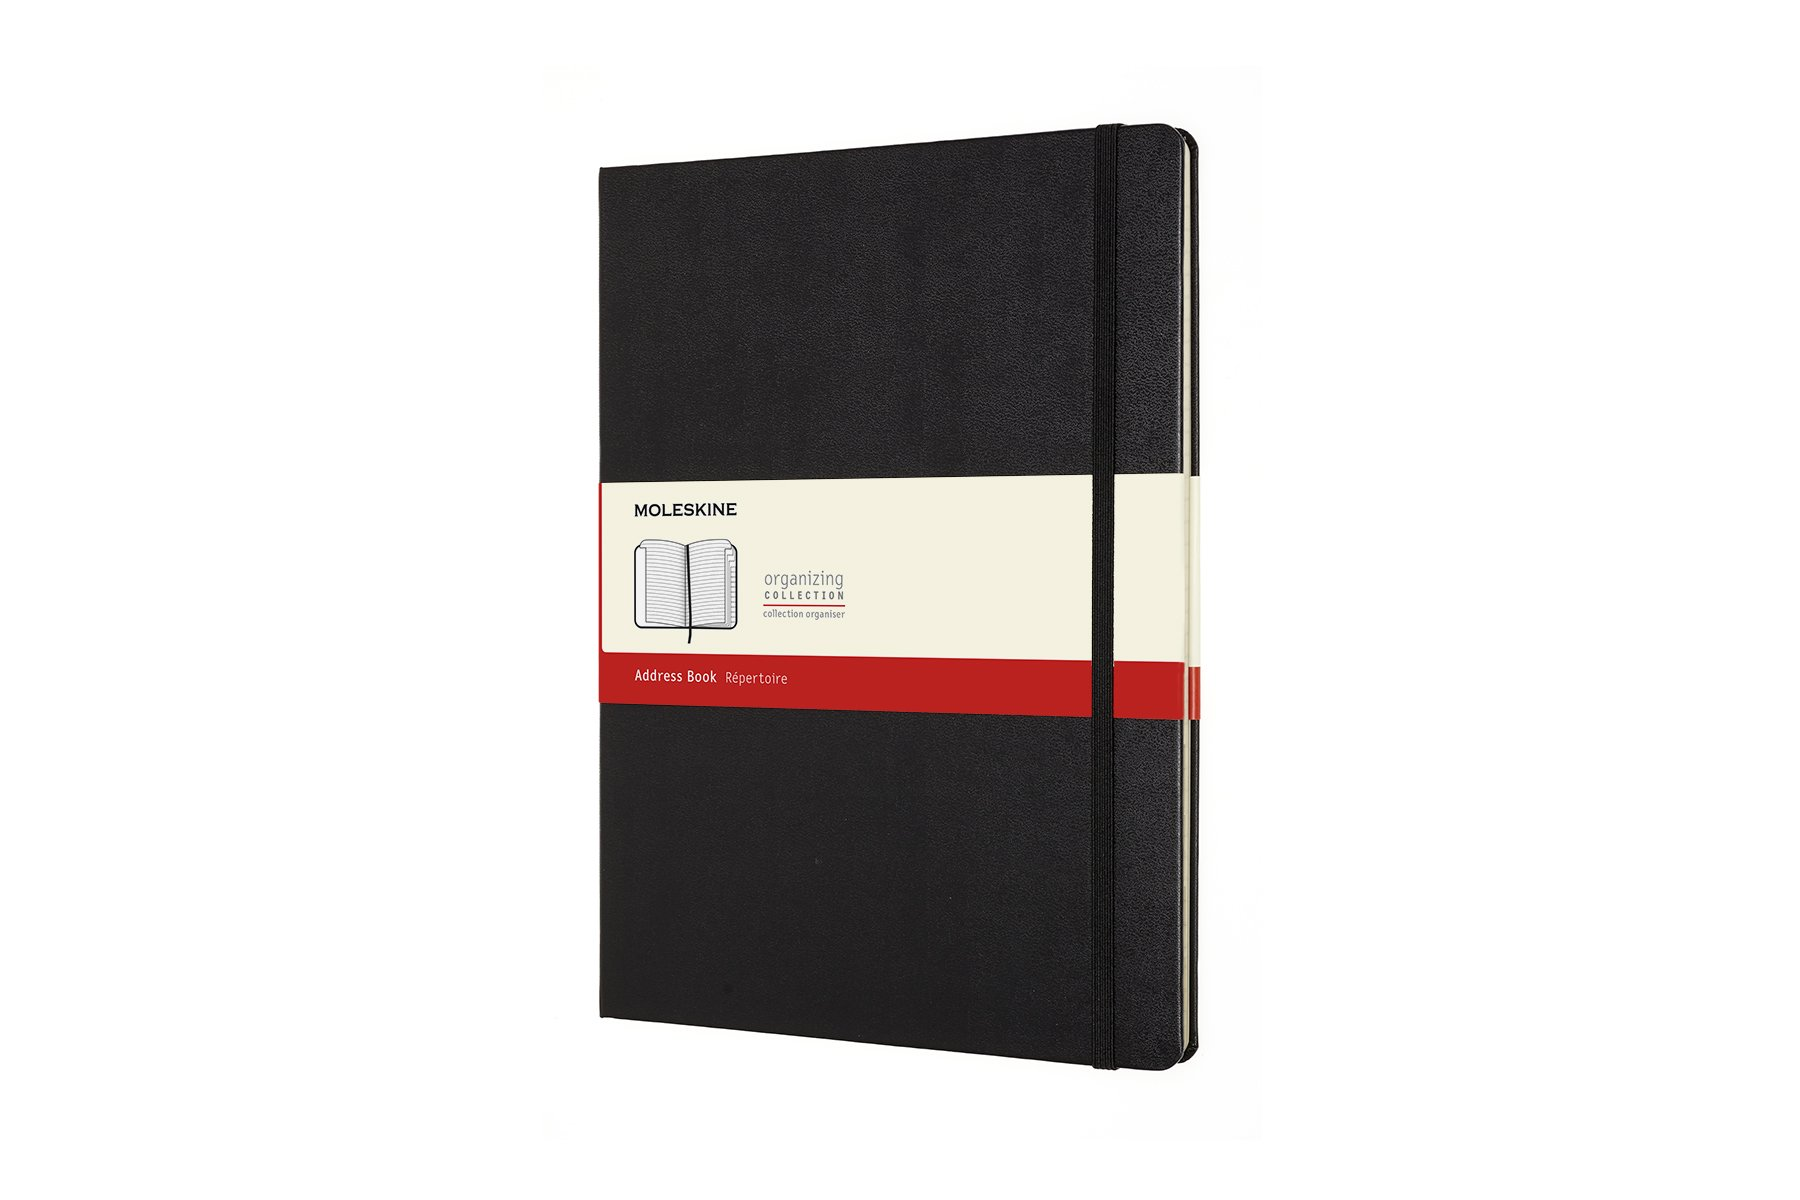 Moleskine Classic Hard Cover Address Book, XL (7.5 x 9.75)..